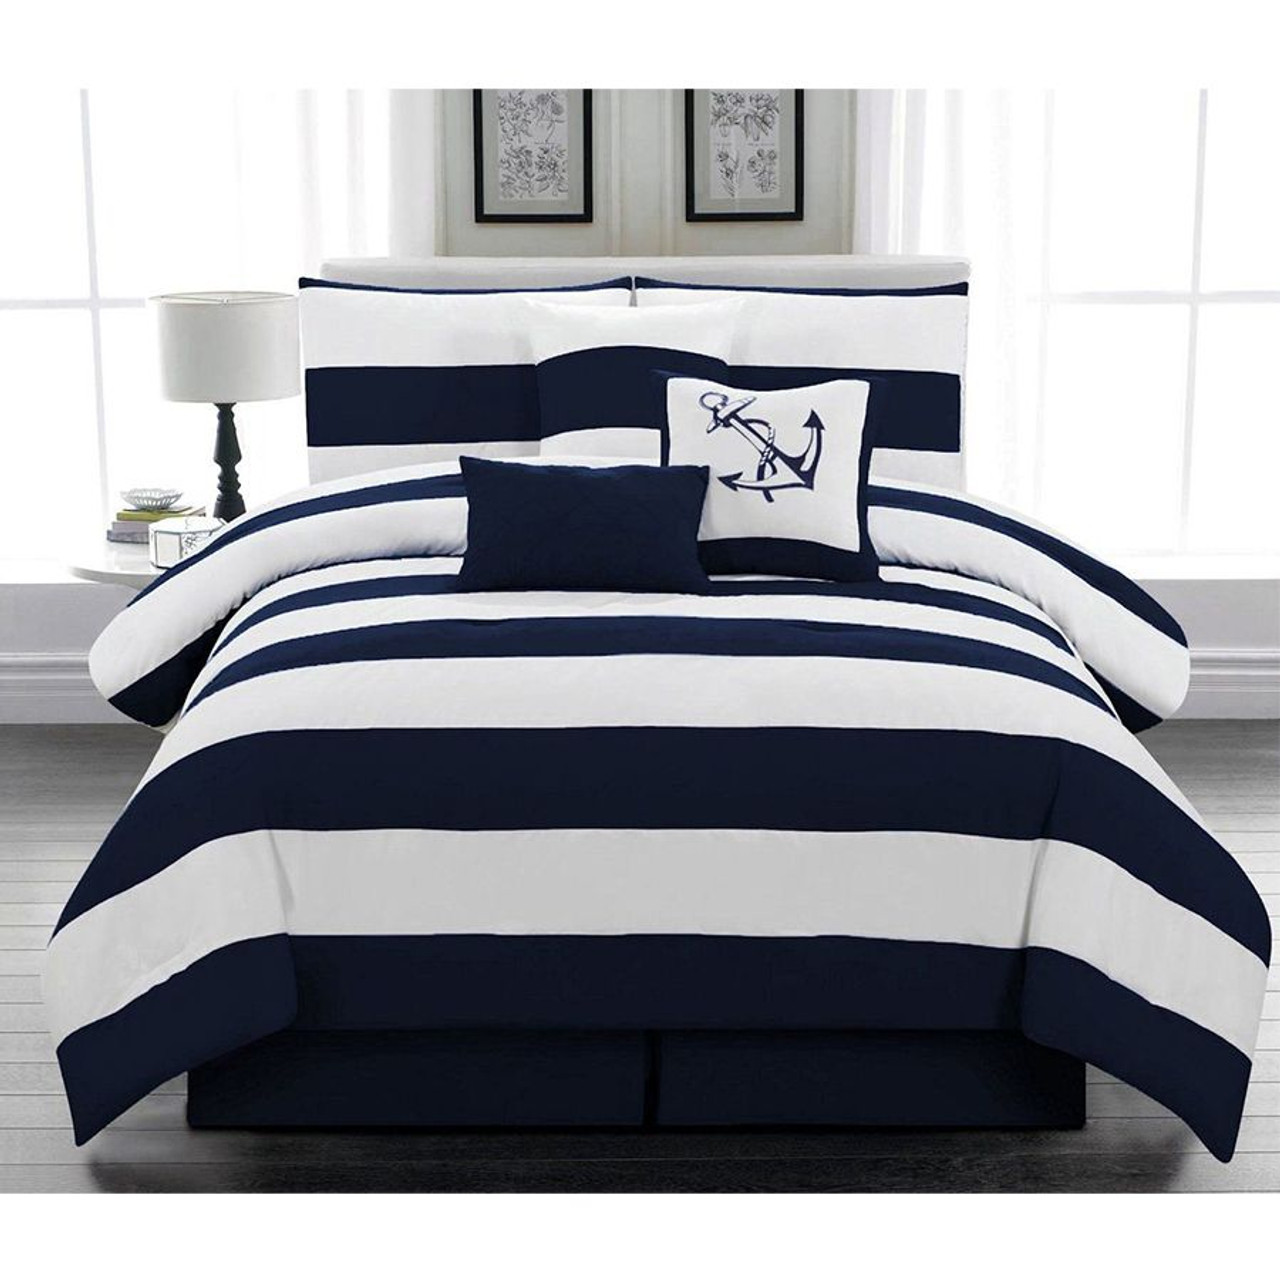 7 pcs Microfiber Navy Nautical Themed Comforter Set